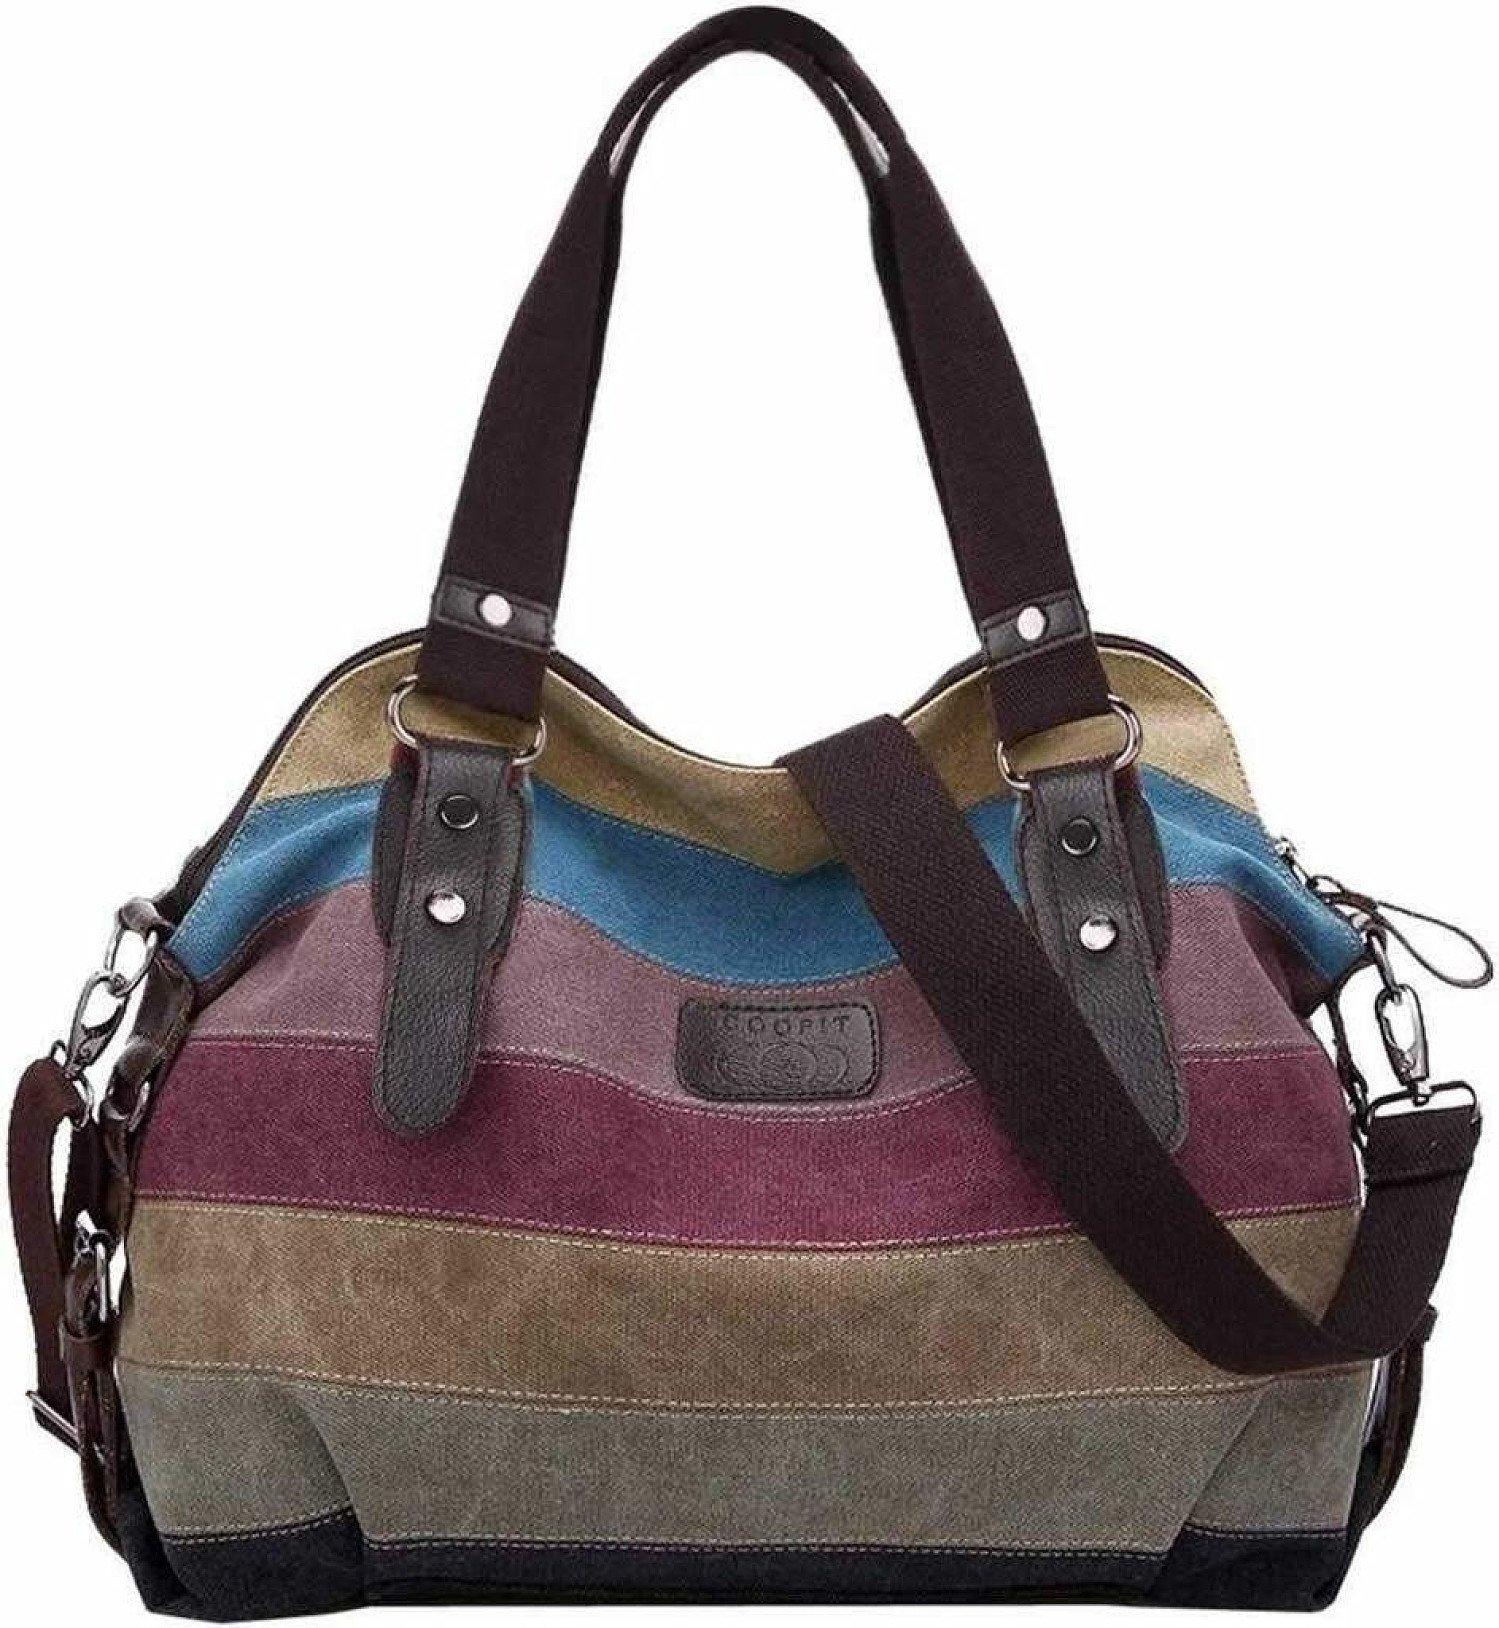 Women's Handbags, Ladies Handbags Striped Canvas Tote Cross body